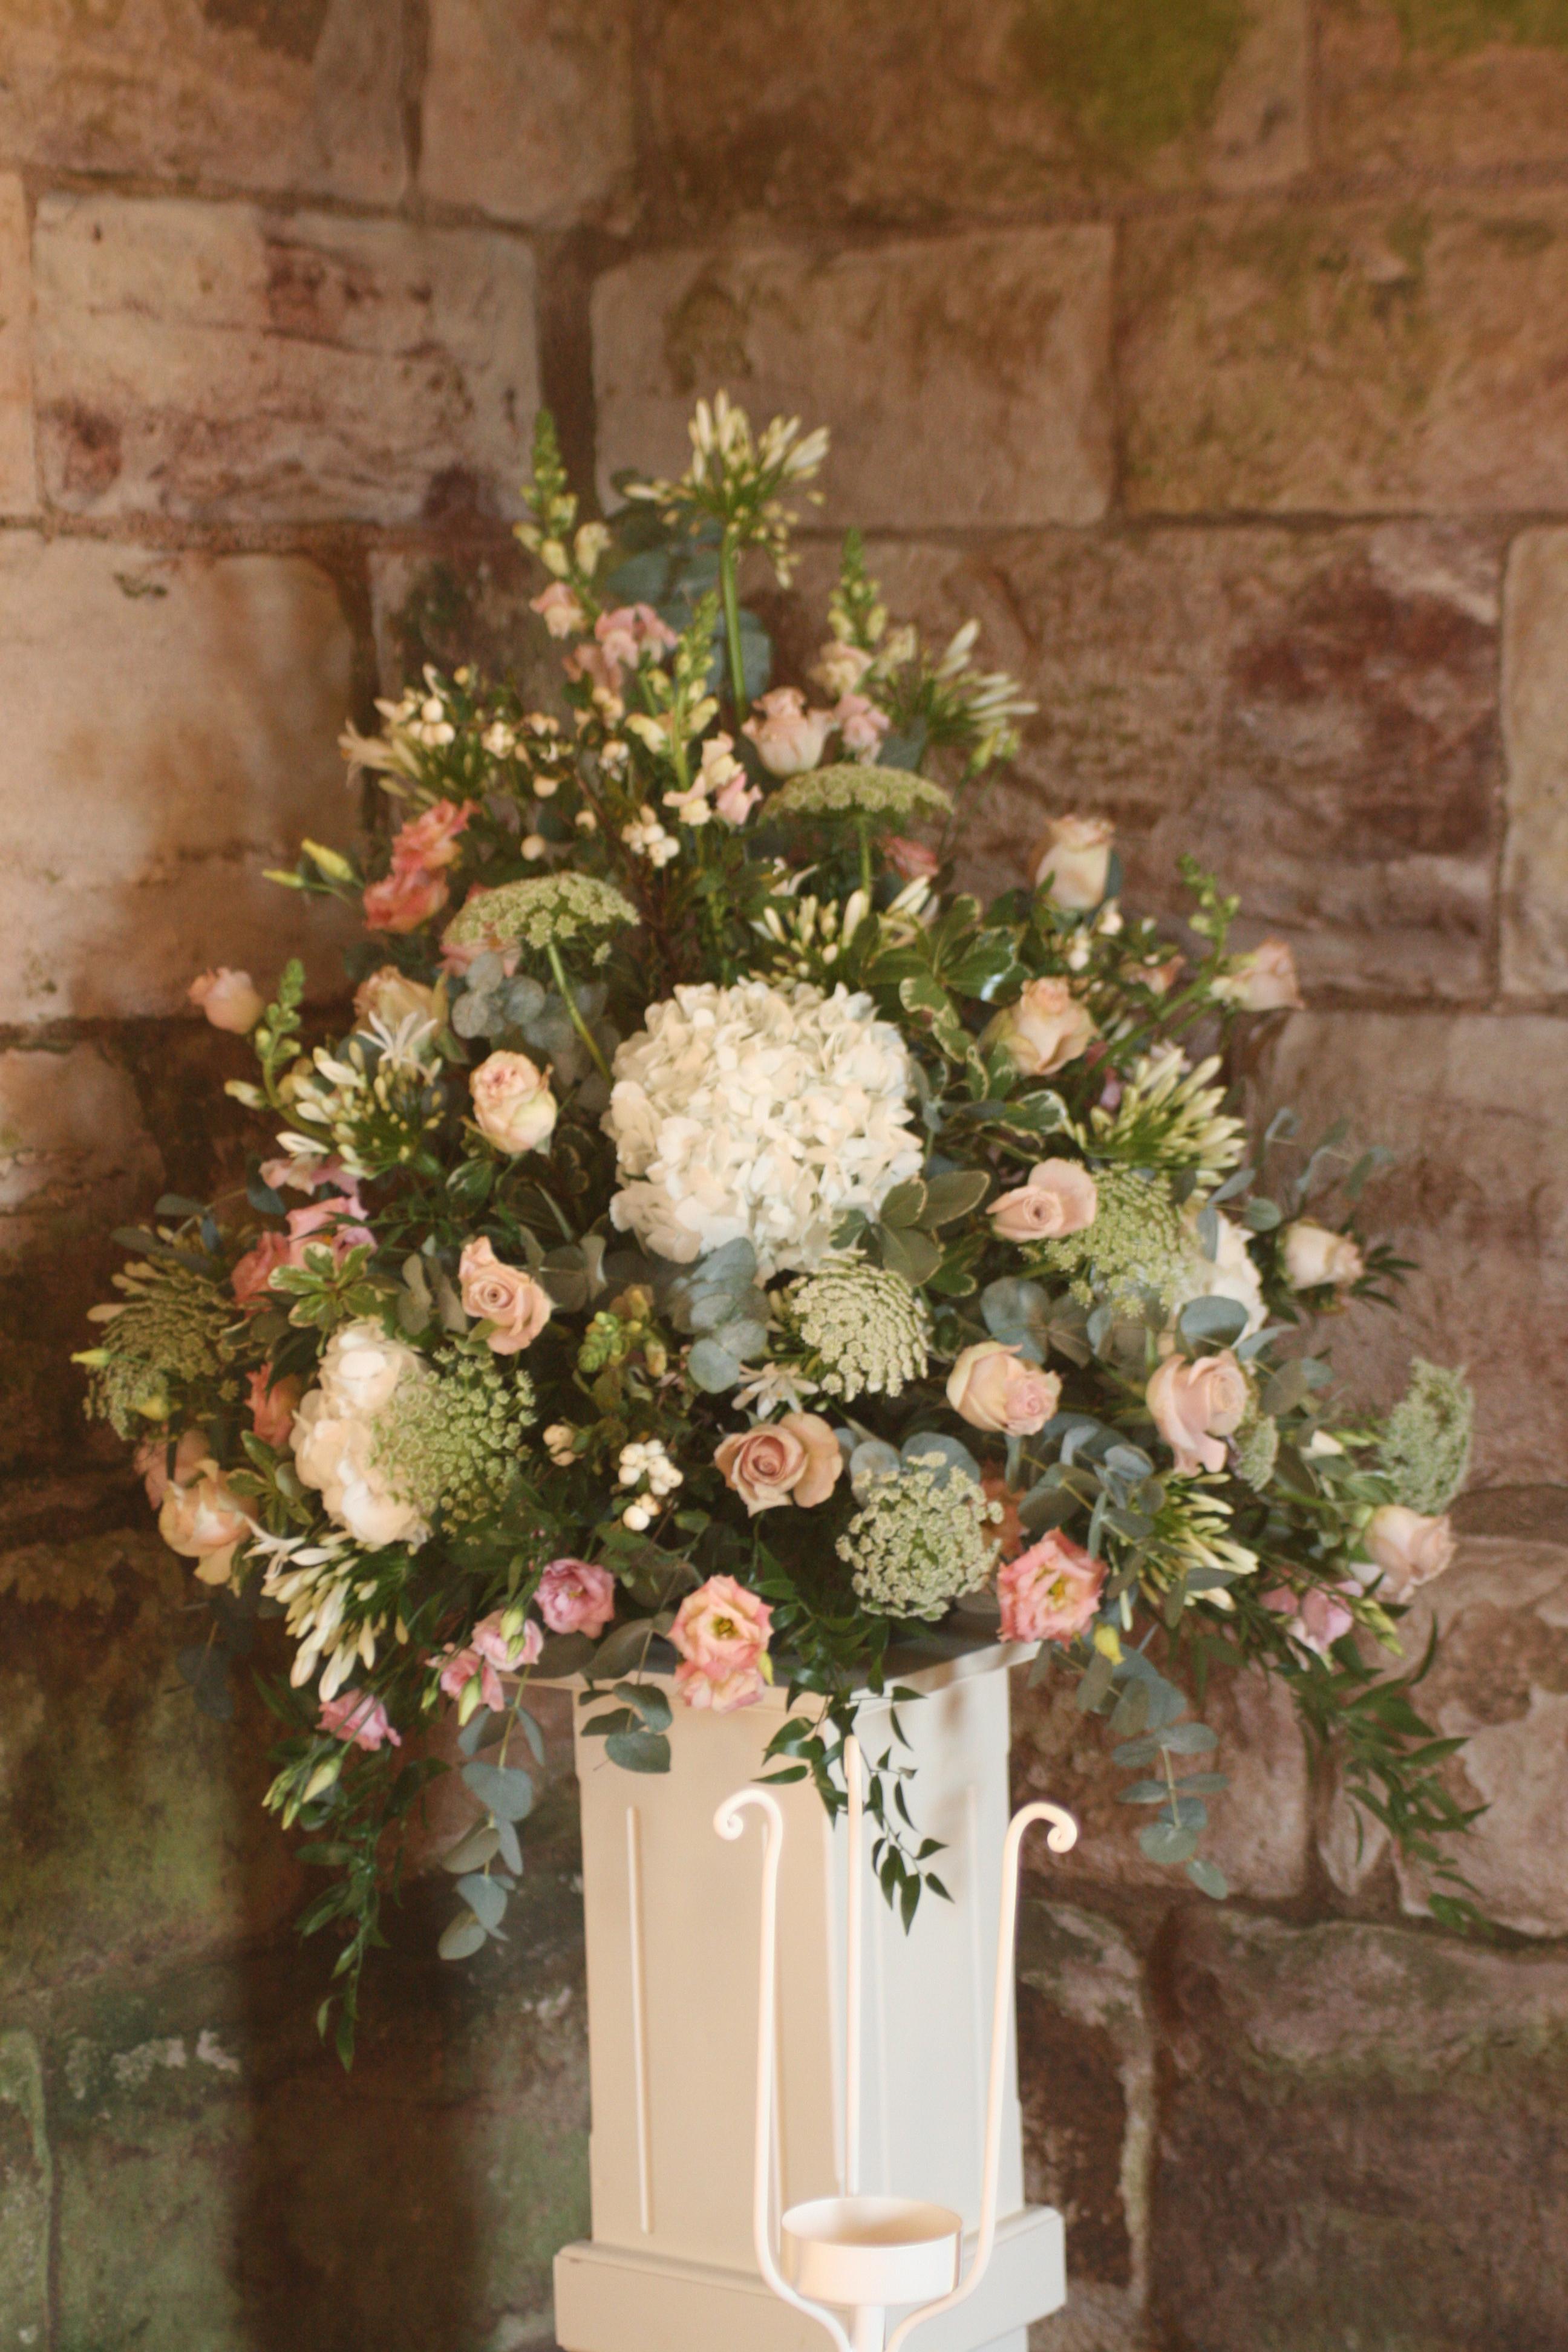 Pedestal arrangement of roses, ammi, hydrangea, eustoma, allium and foliage